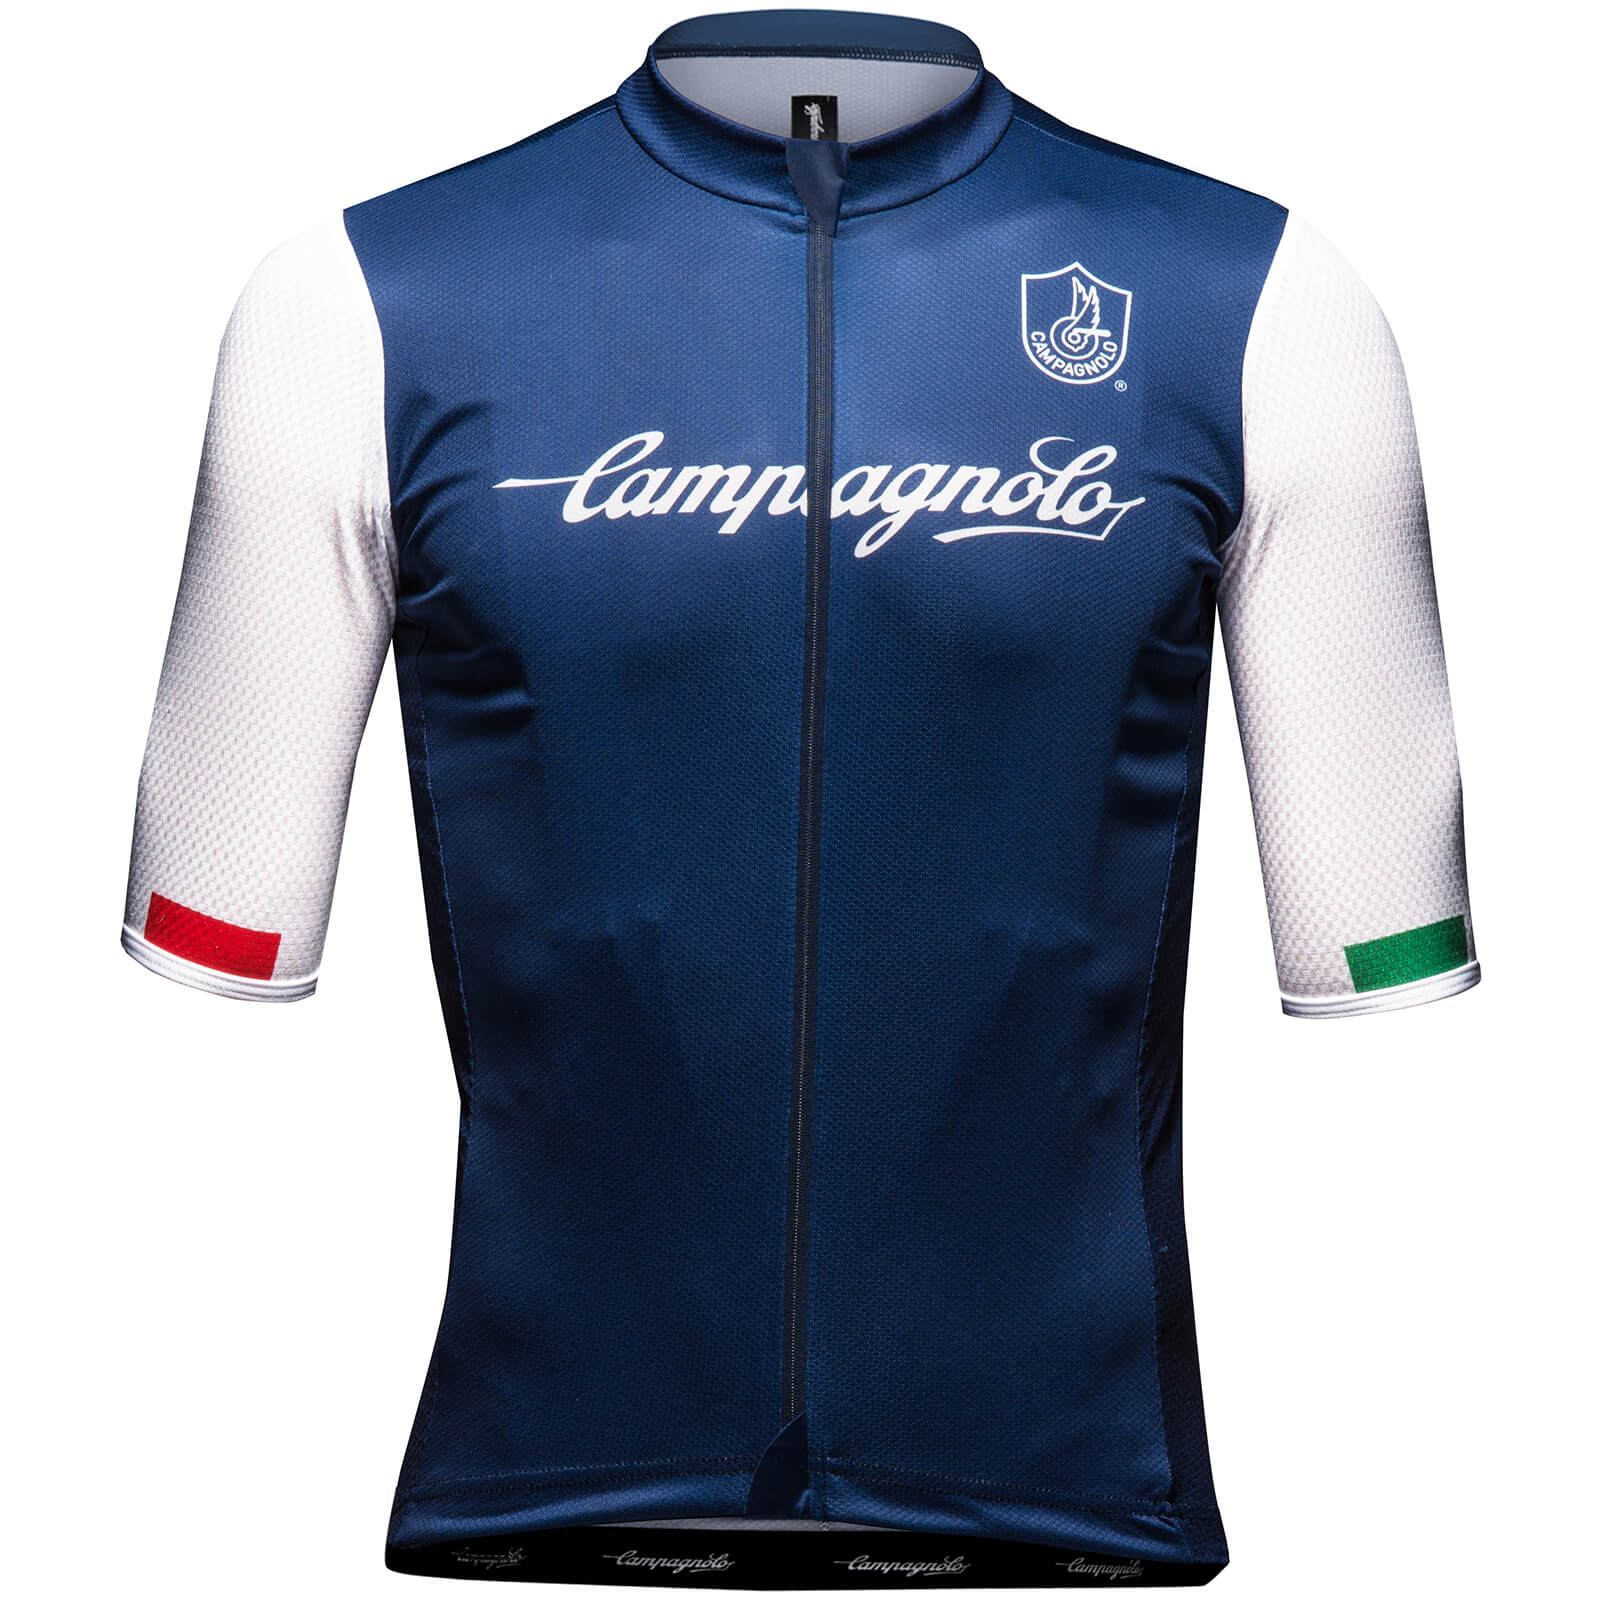 Nalini Campagnolo Iridio Jersey - S - Blue/White